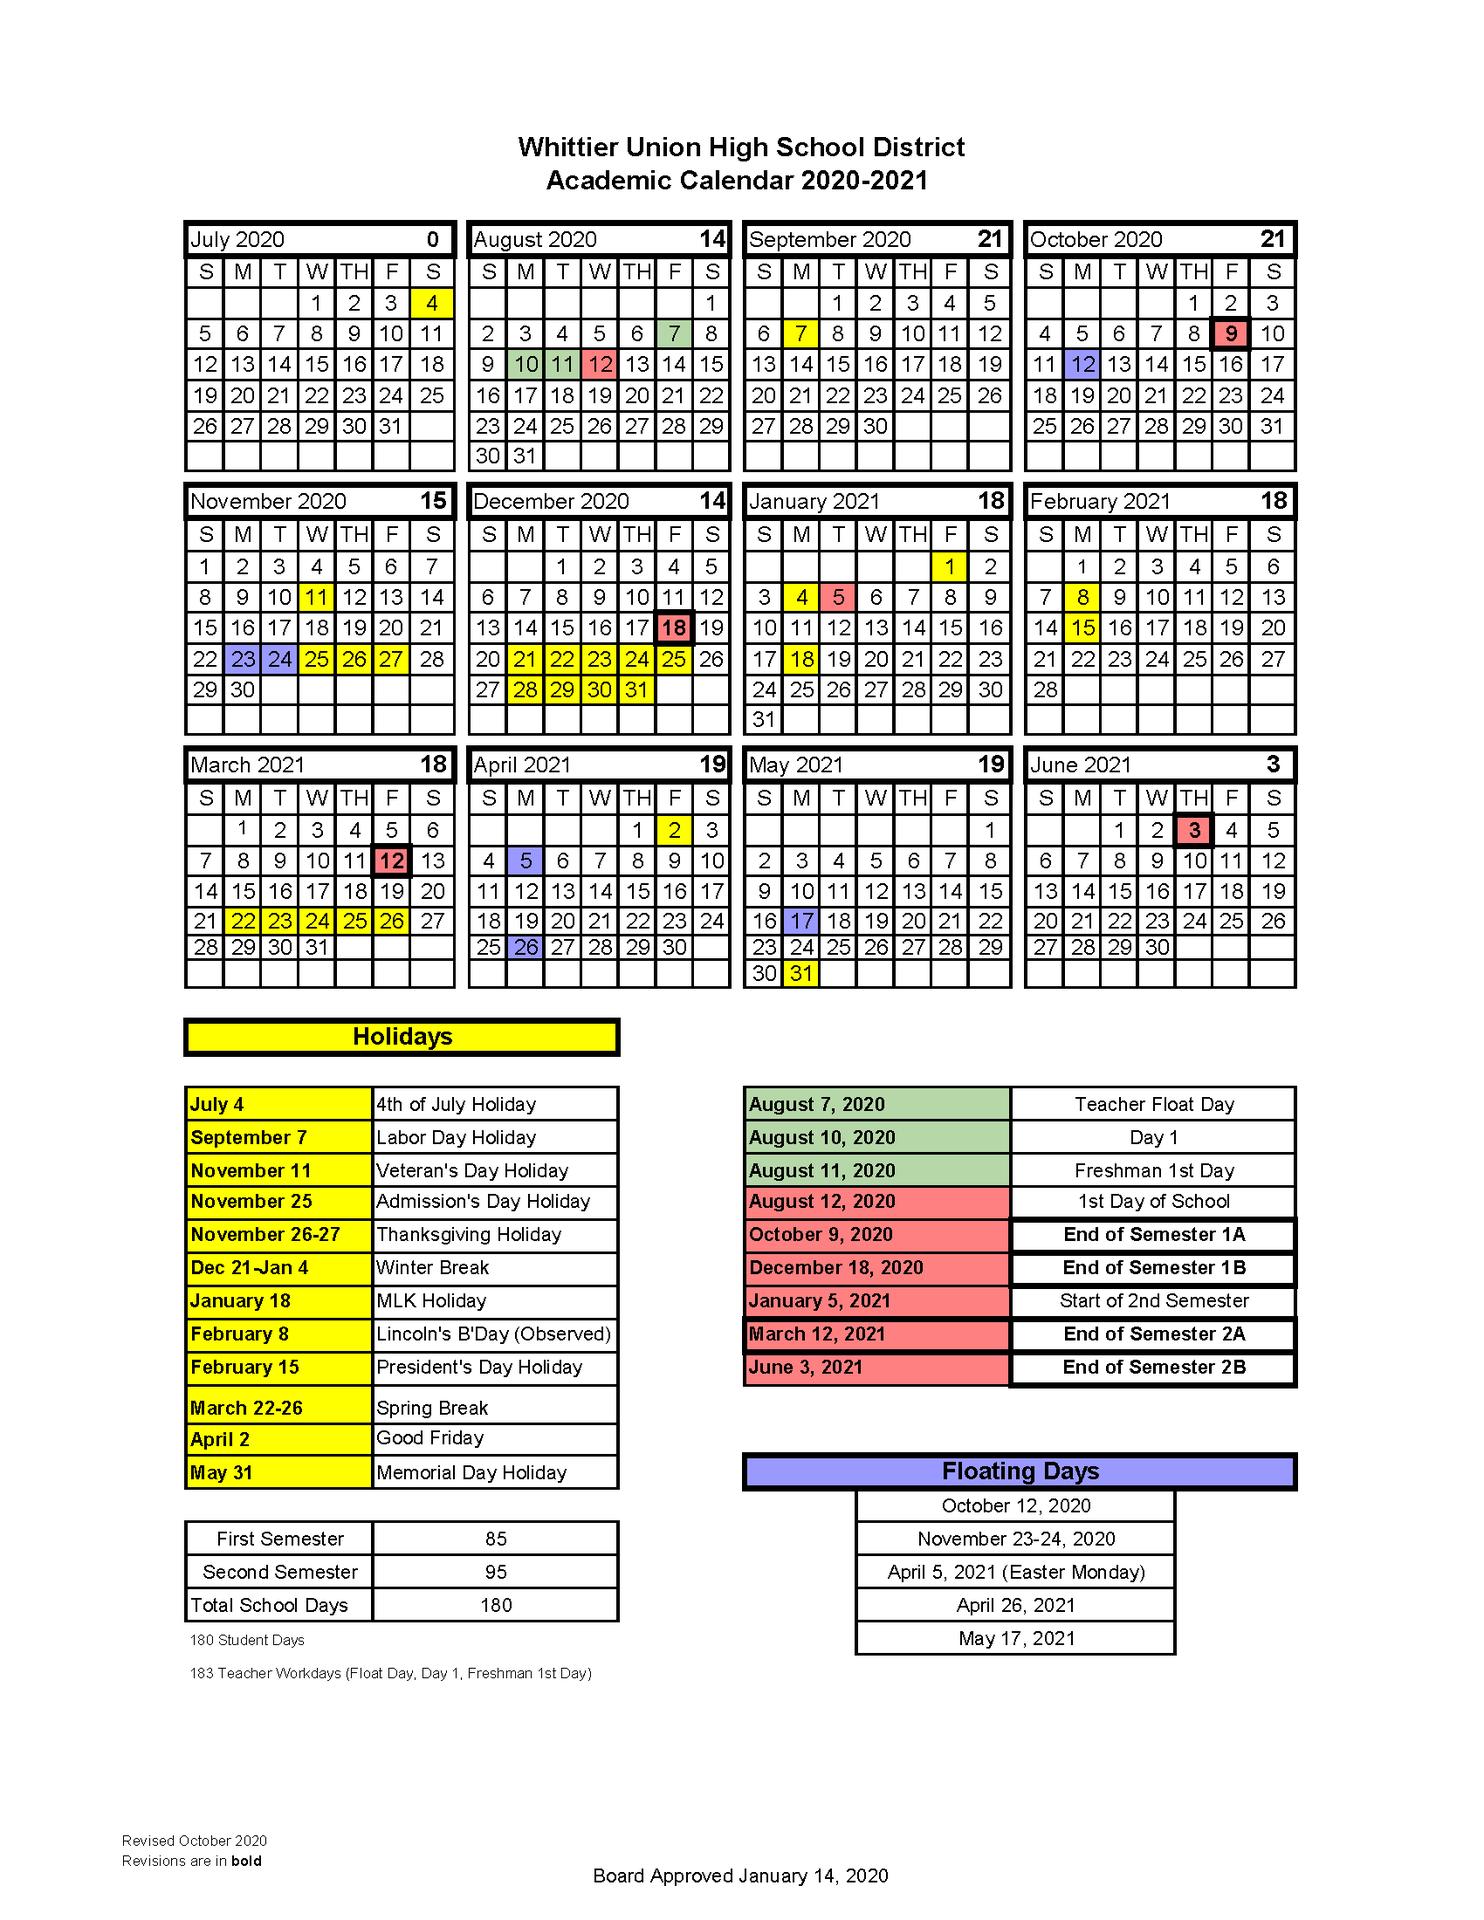 Revised 2020-21 Academic Calendar